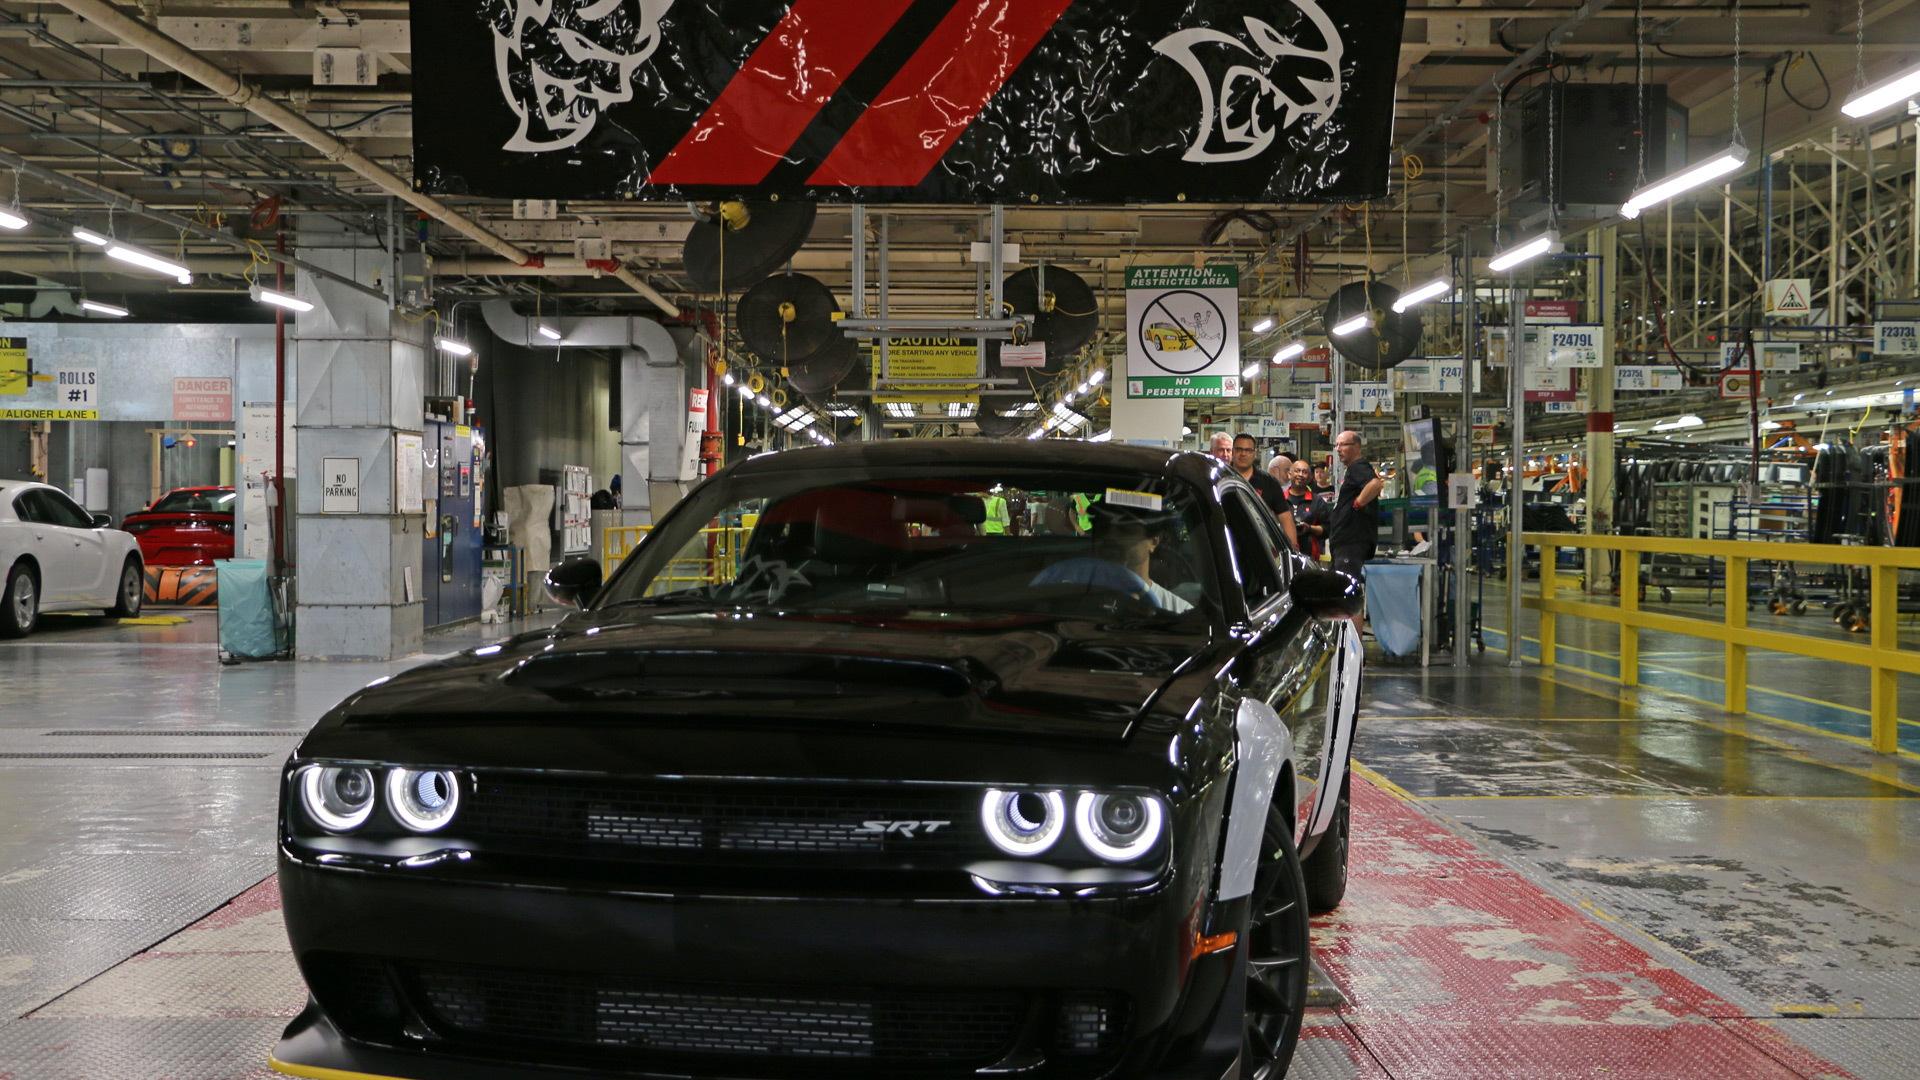 Final 2018 Dodge Challenger SRT Demon rolls off the line at Brampton, Canada plant